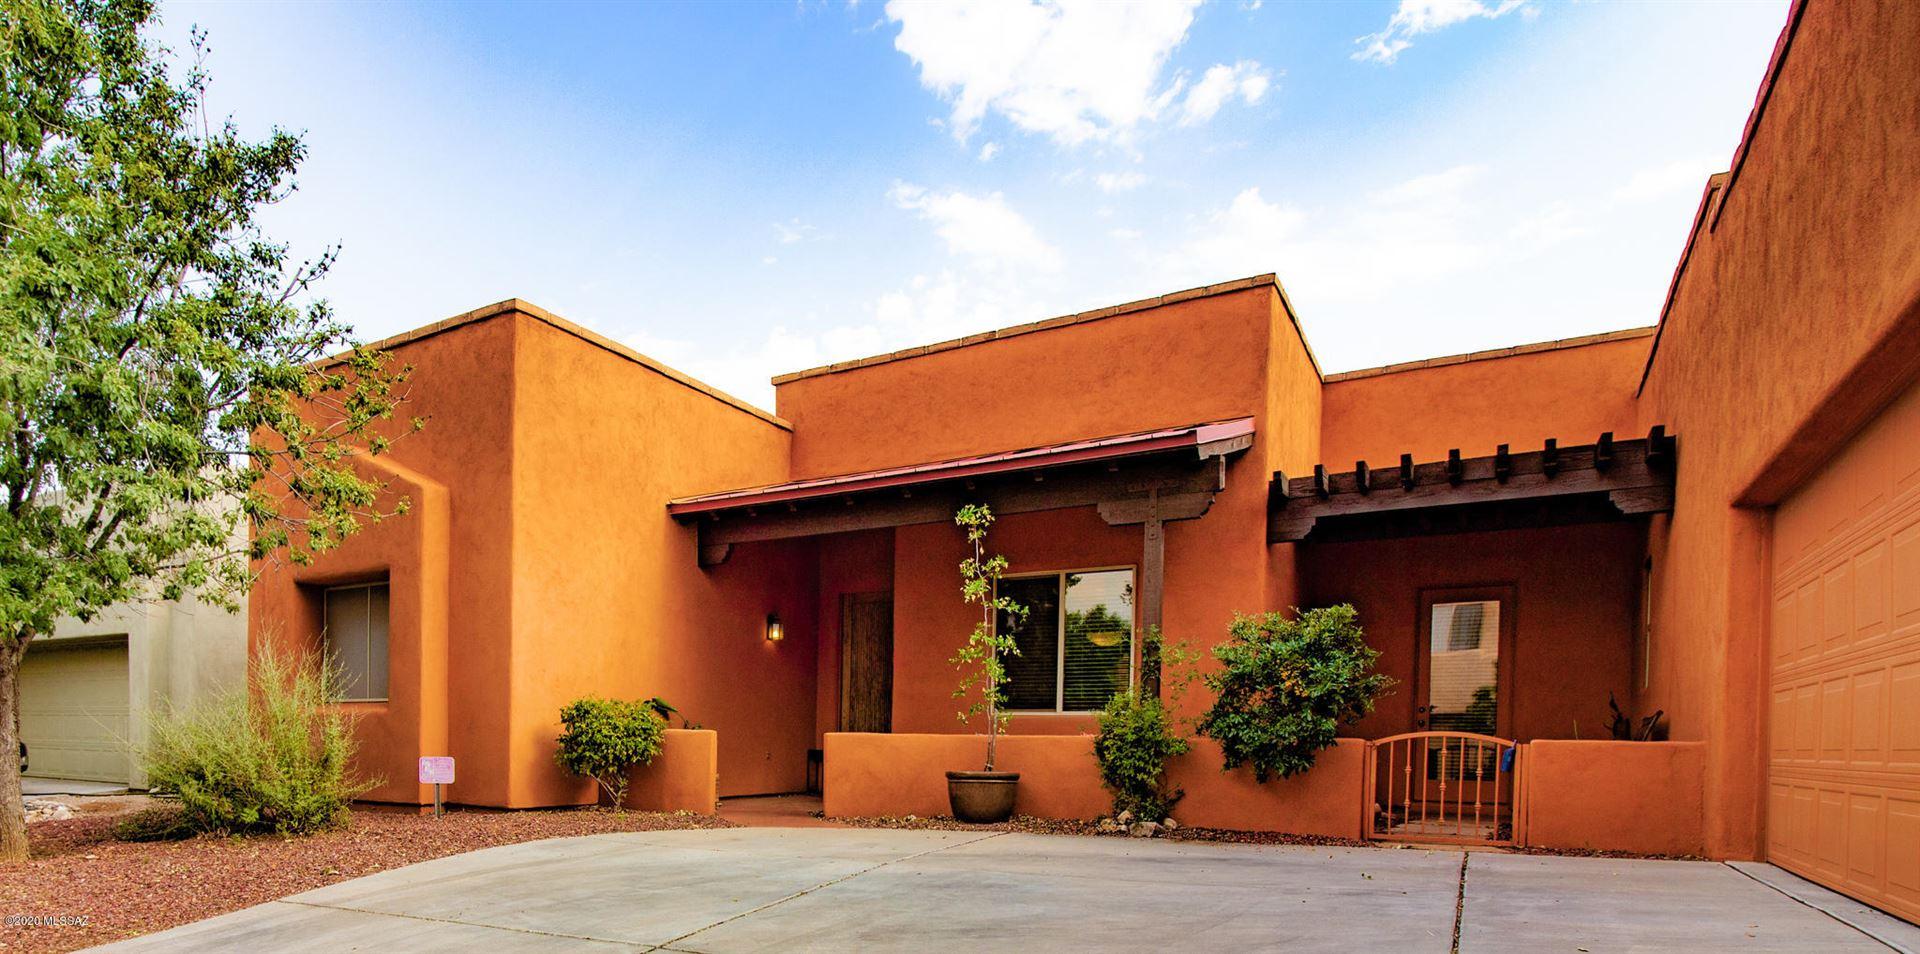 10544 E George Brookbank Place, Tucson, AZ 85747 - MLS#: 22021425